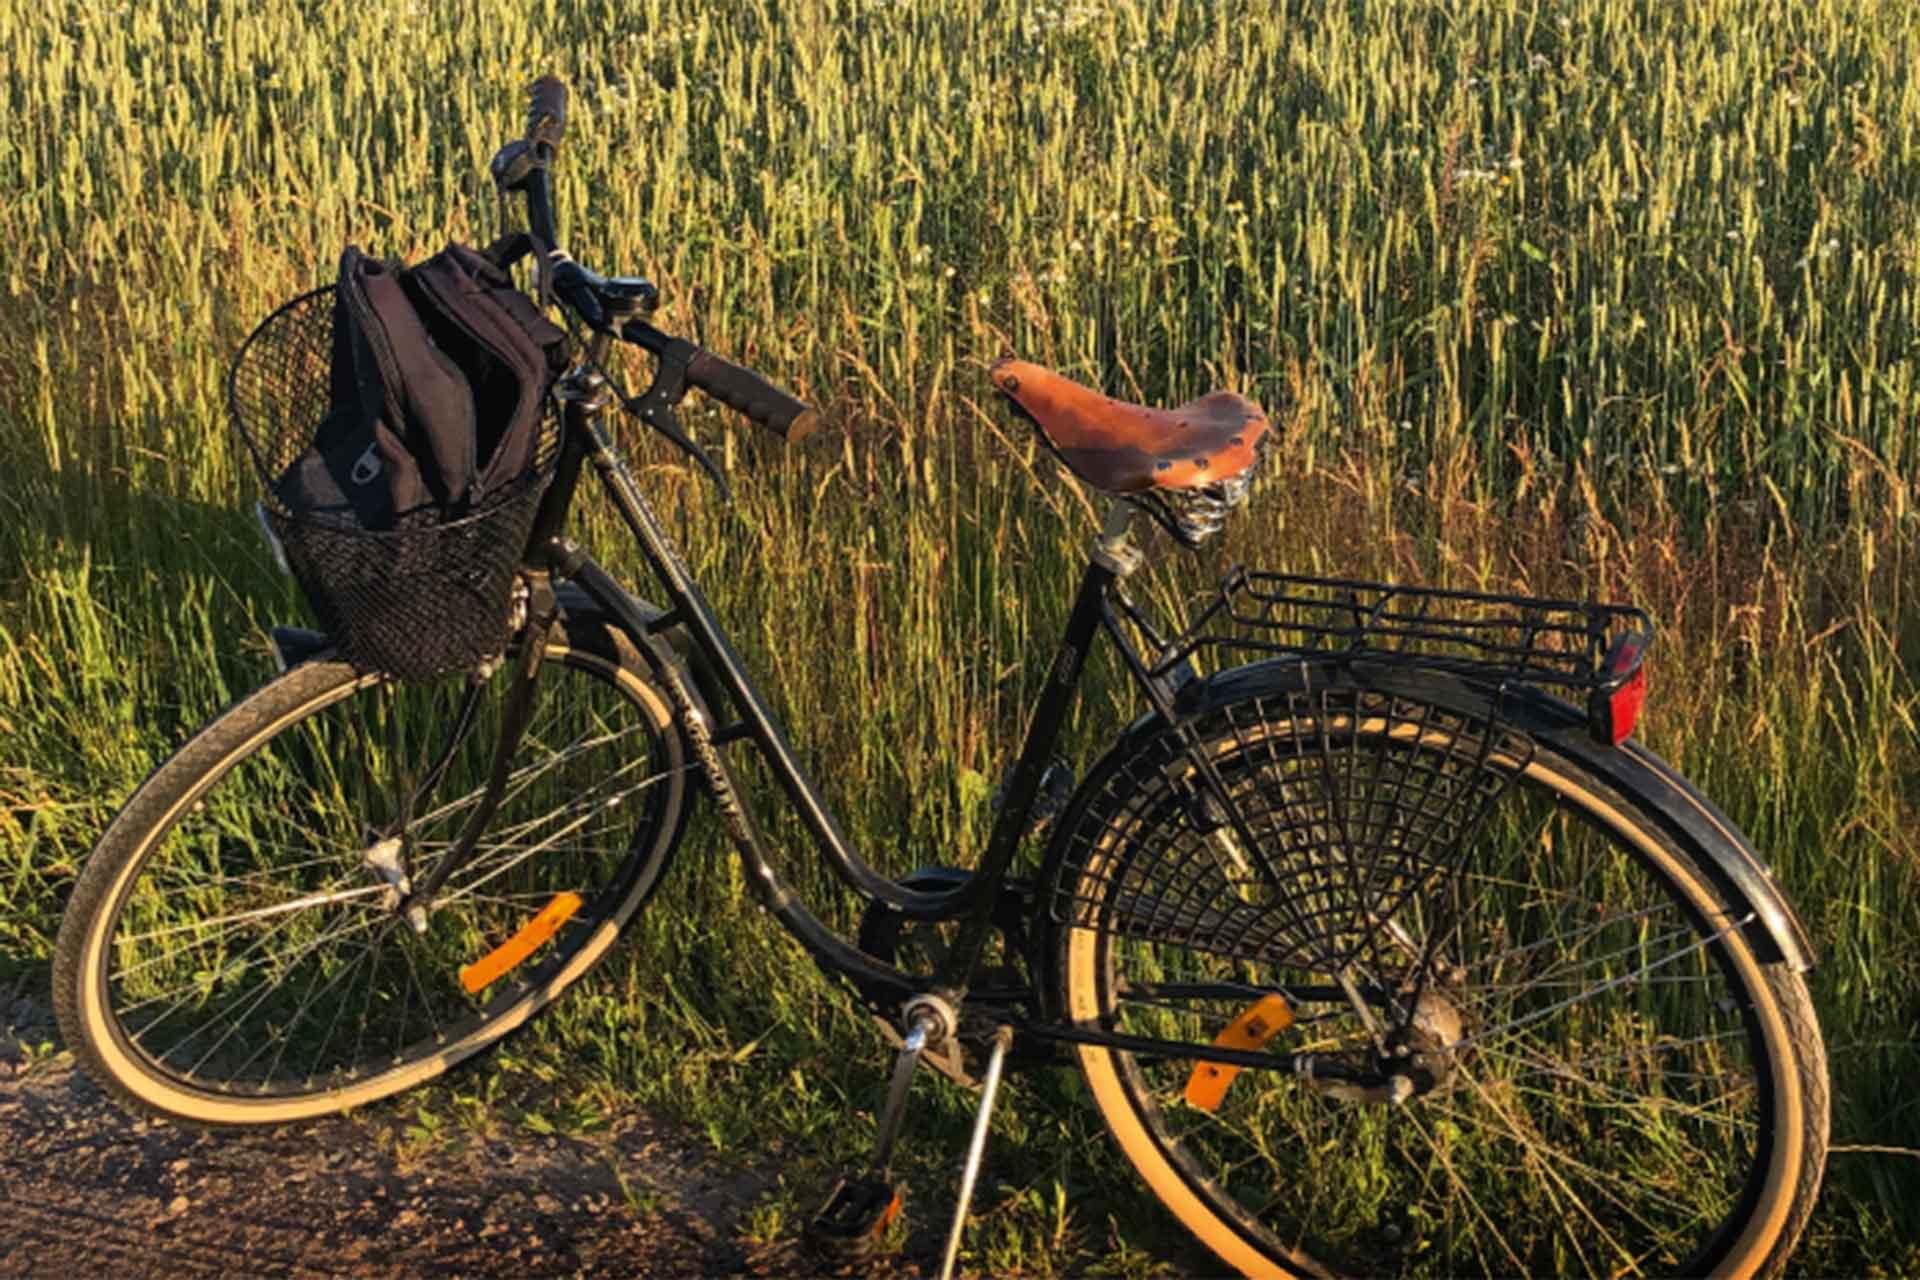 Cykel vid sädesfält.